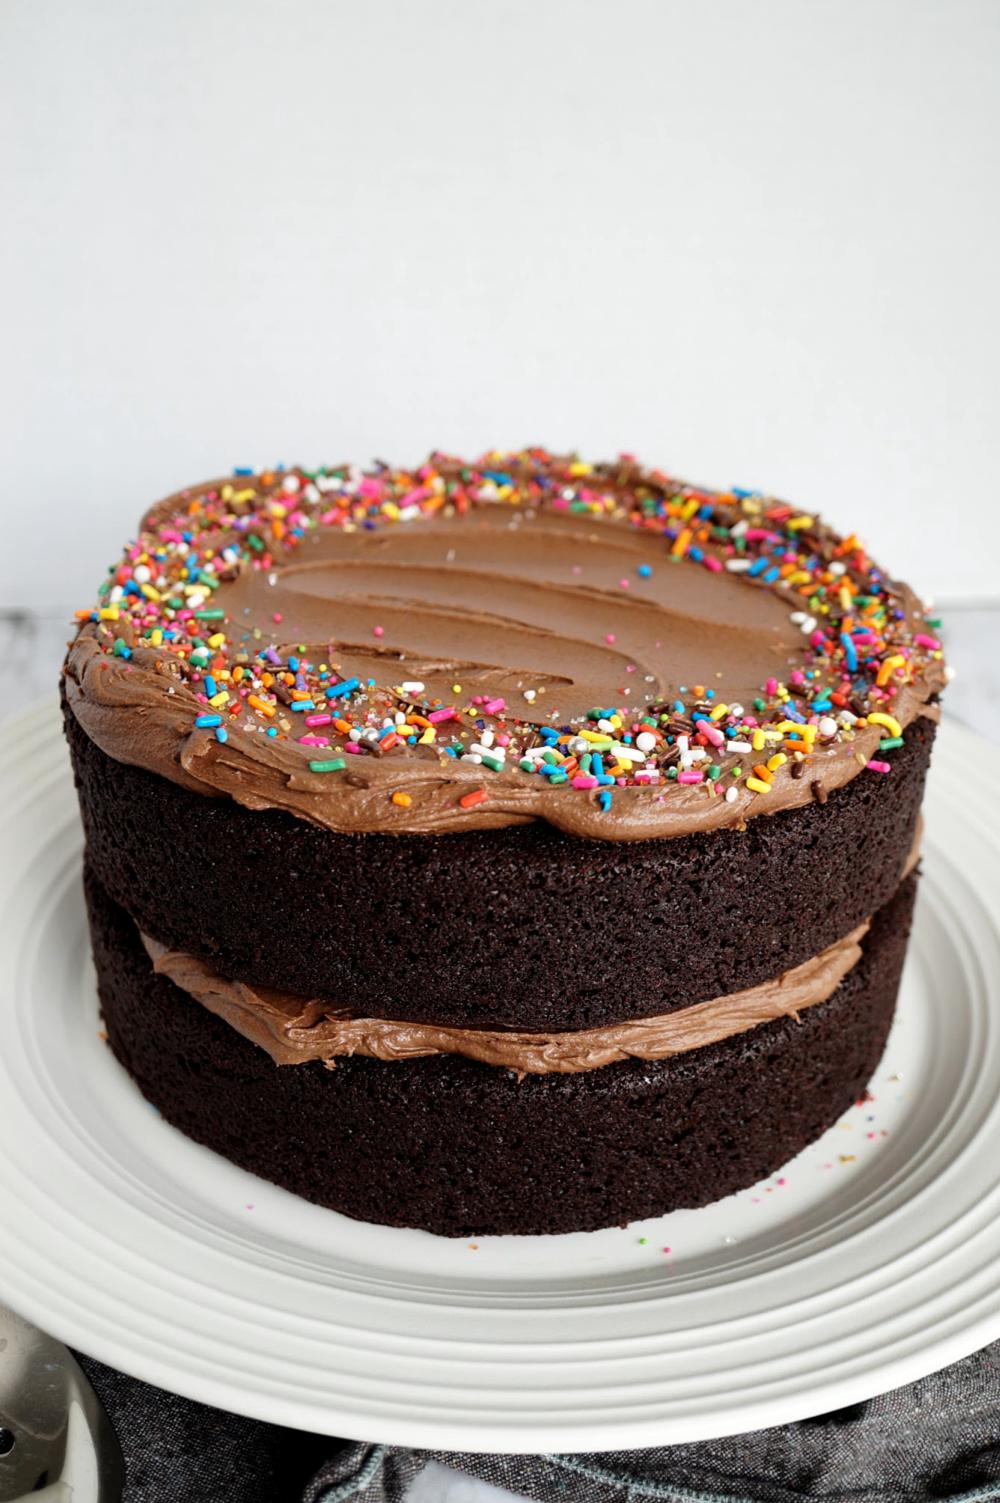 Easy Chocolate Cake Vegan Baking Basics The Baking Fairy